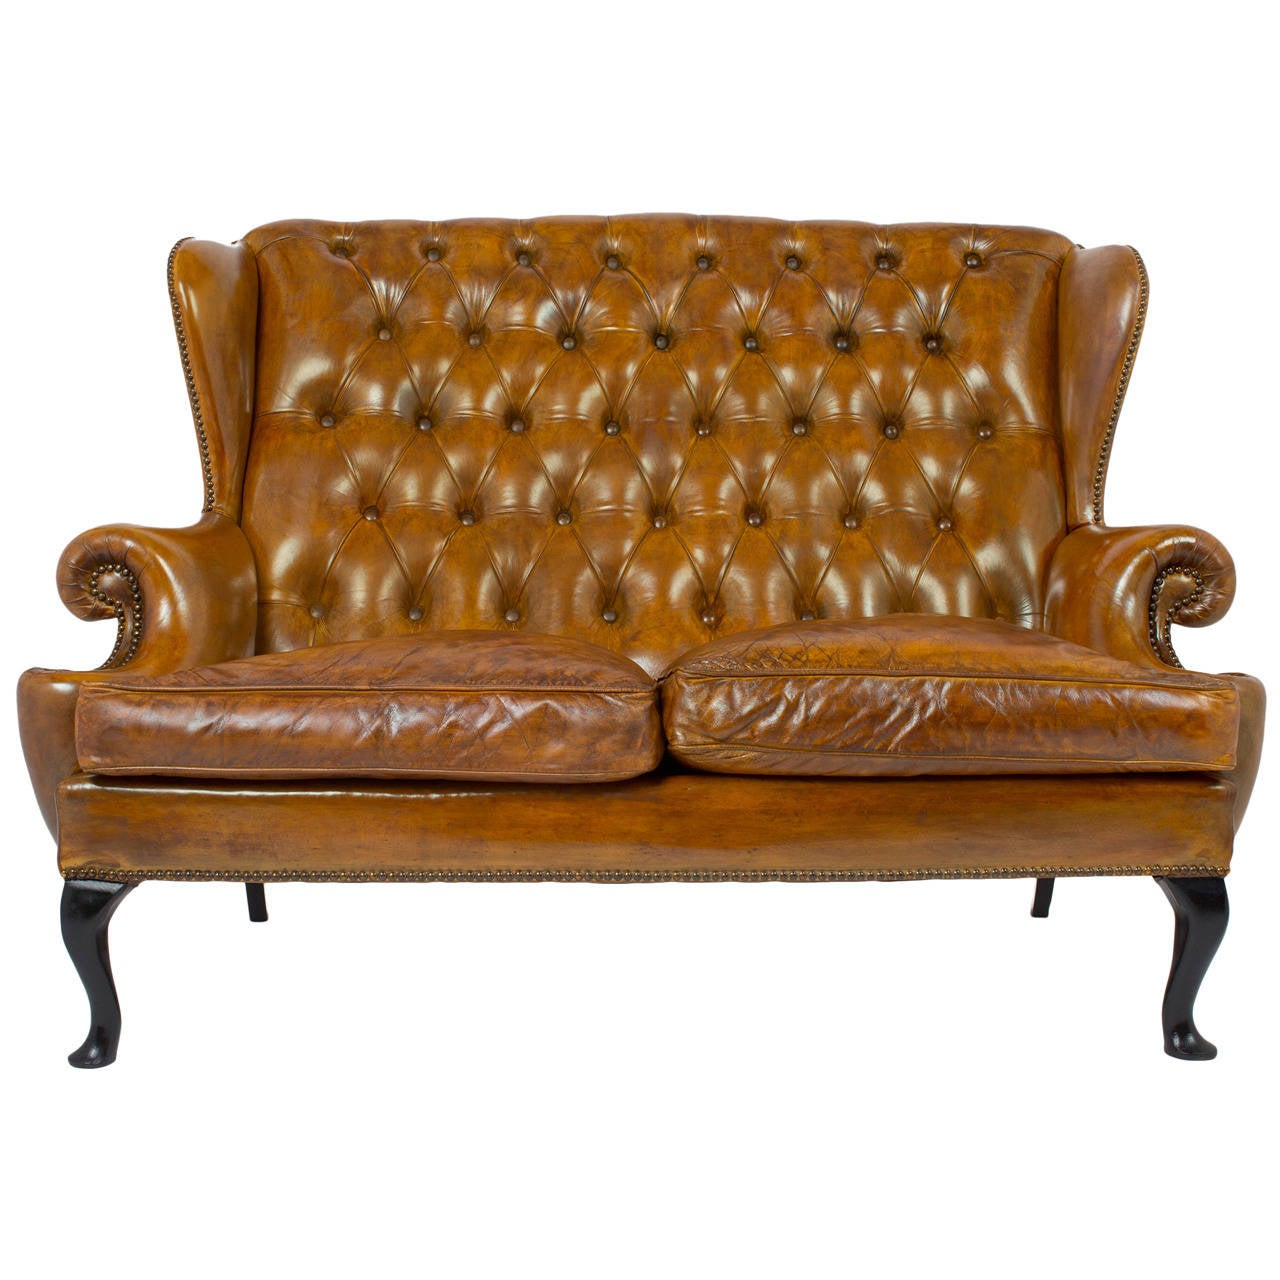 Vintage Tufted Leather Wingback Sofa At 1stdibs